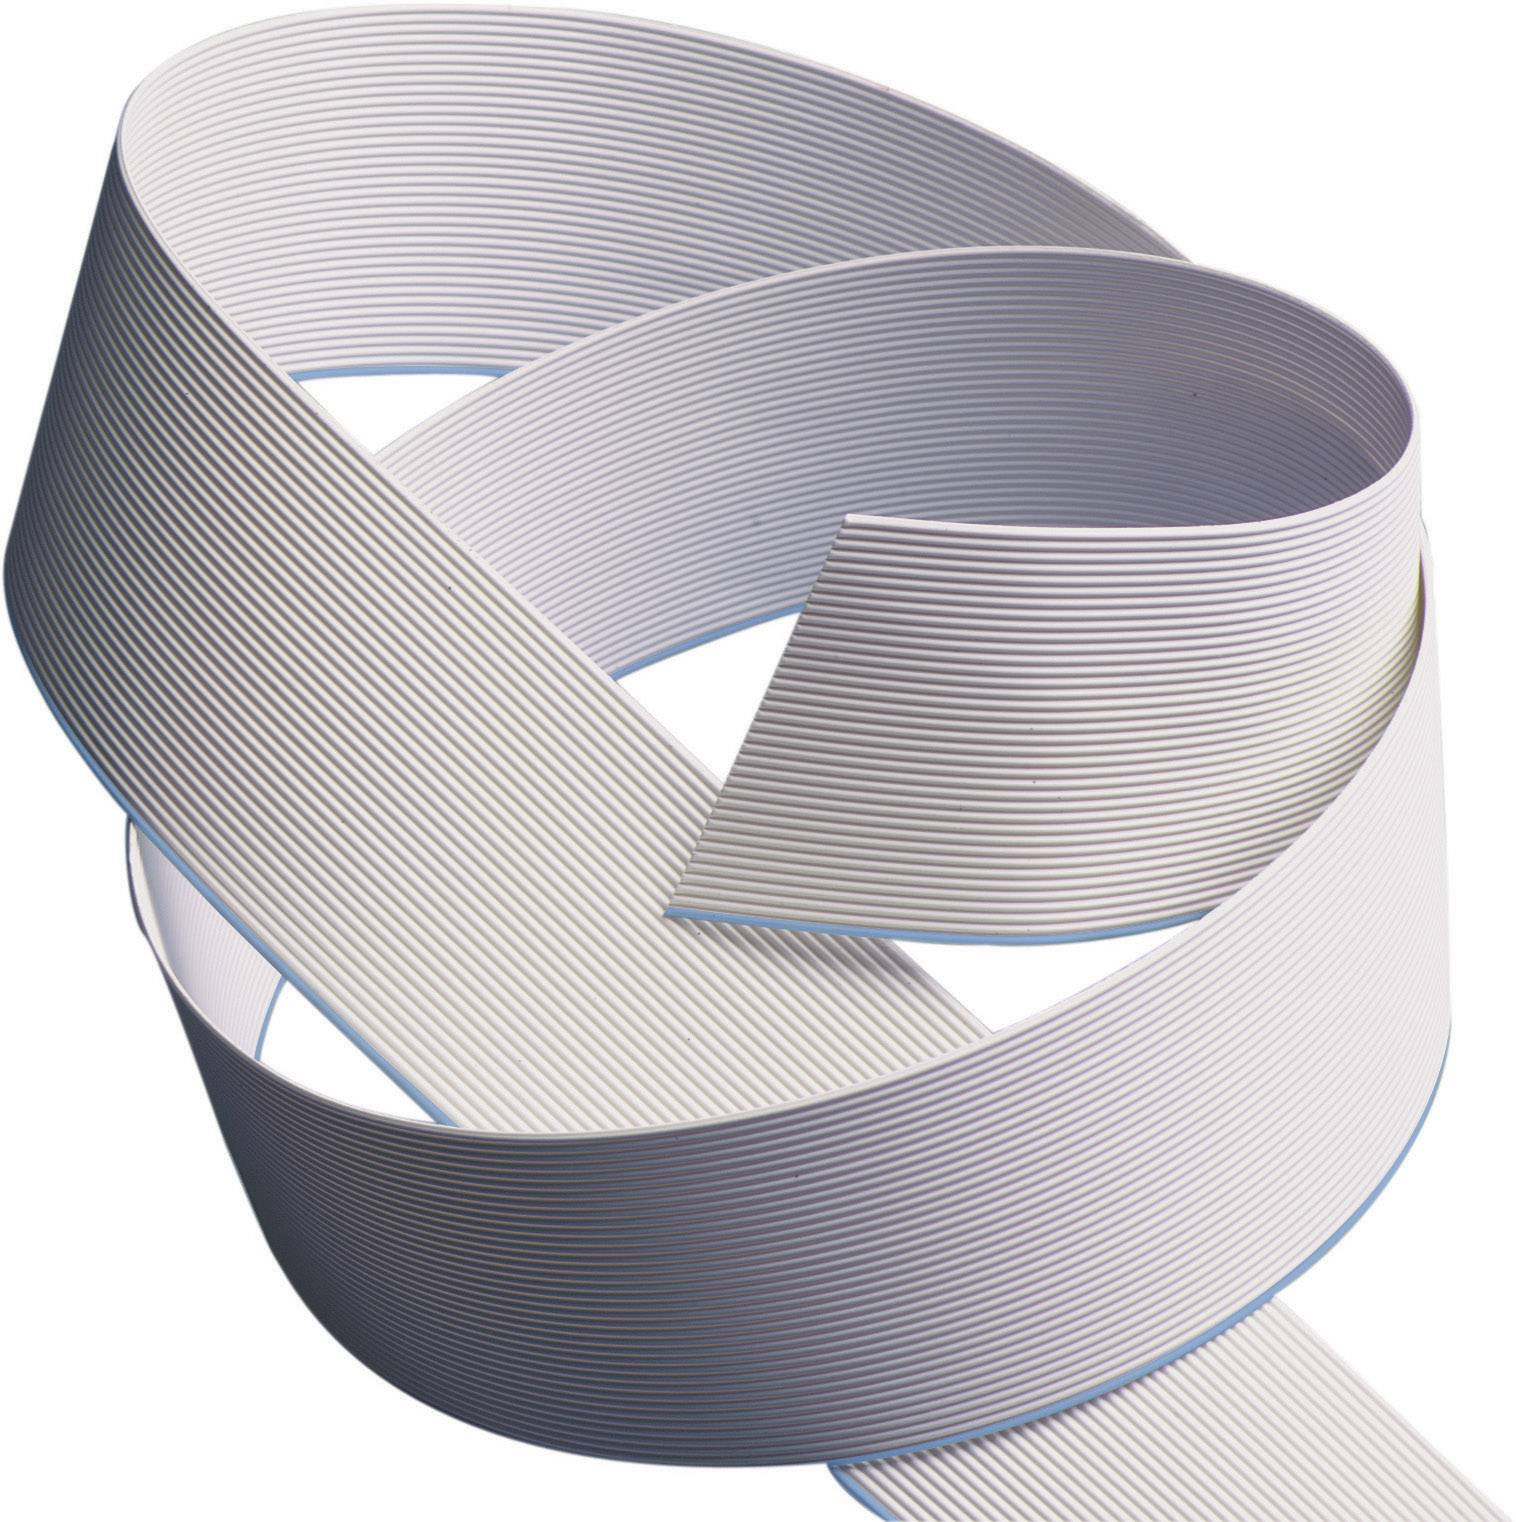 Plochý kábel 3M 7000057364, rozteč 1.27 mm, 20 x 0.08 mm², sivá, metrový tovar